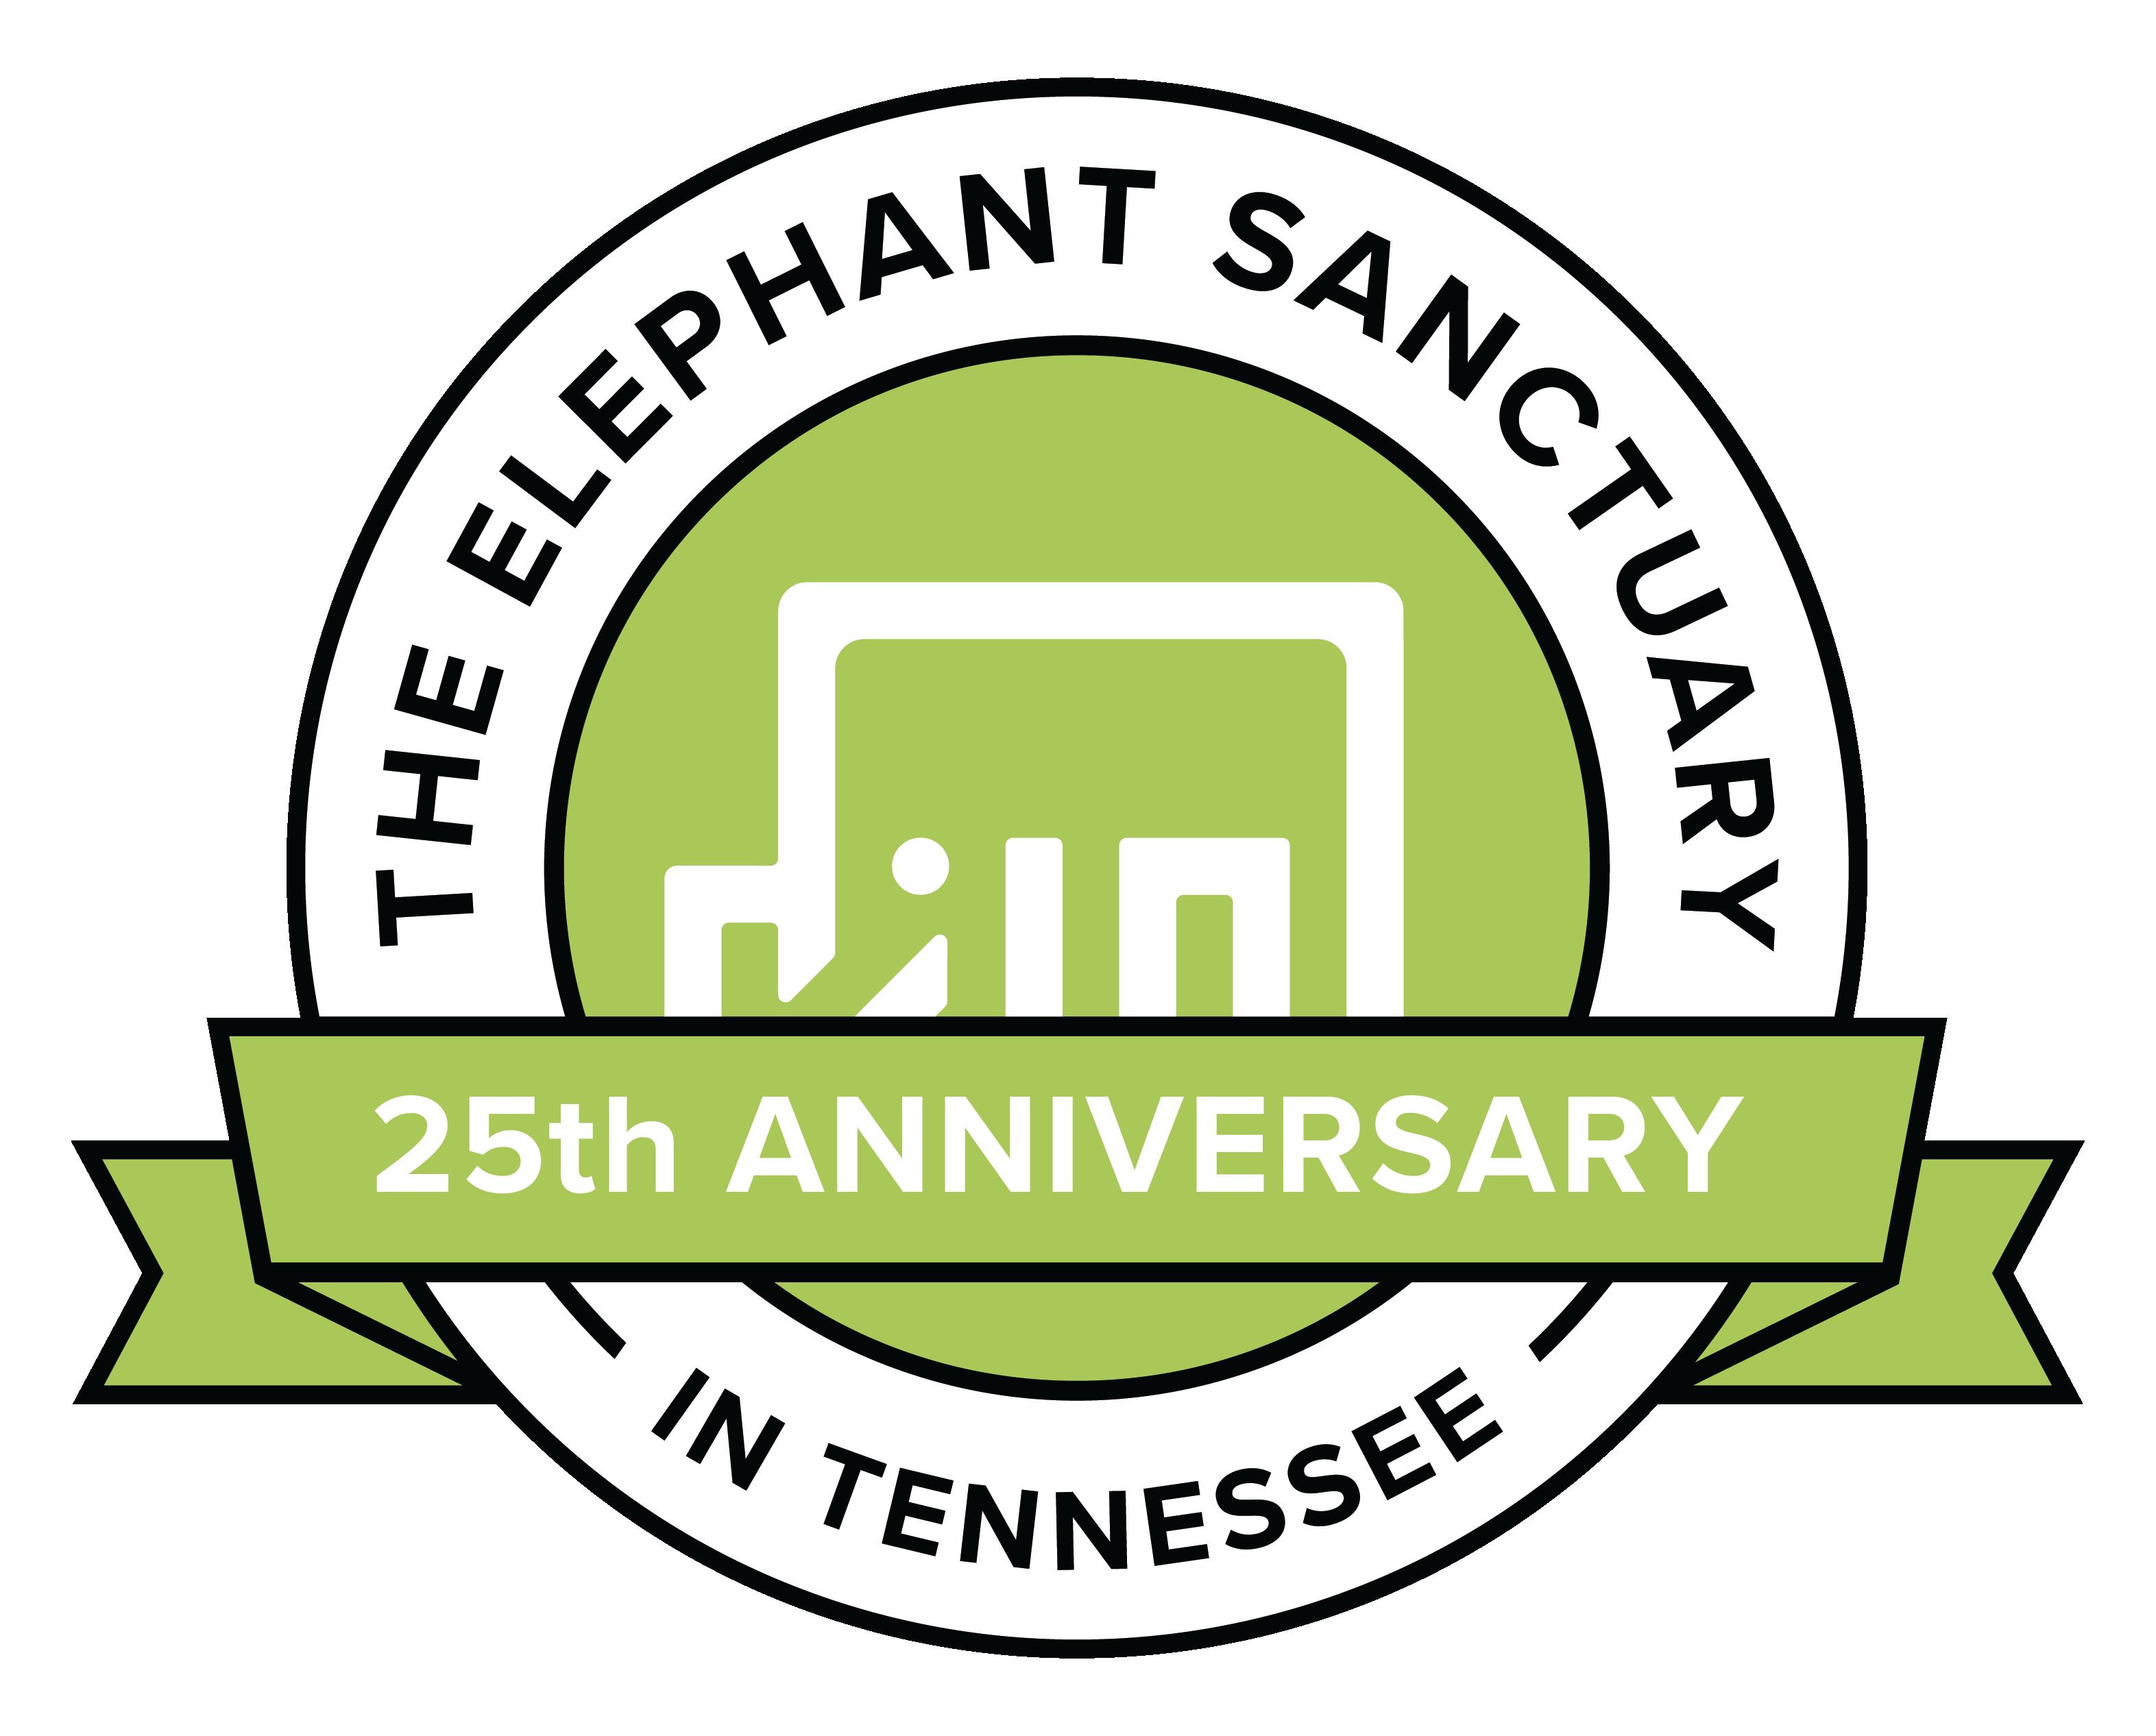 Elephant Sanctuary of Tennessee